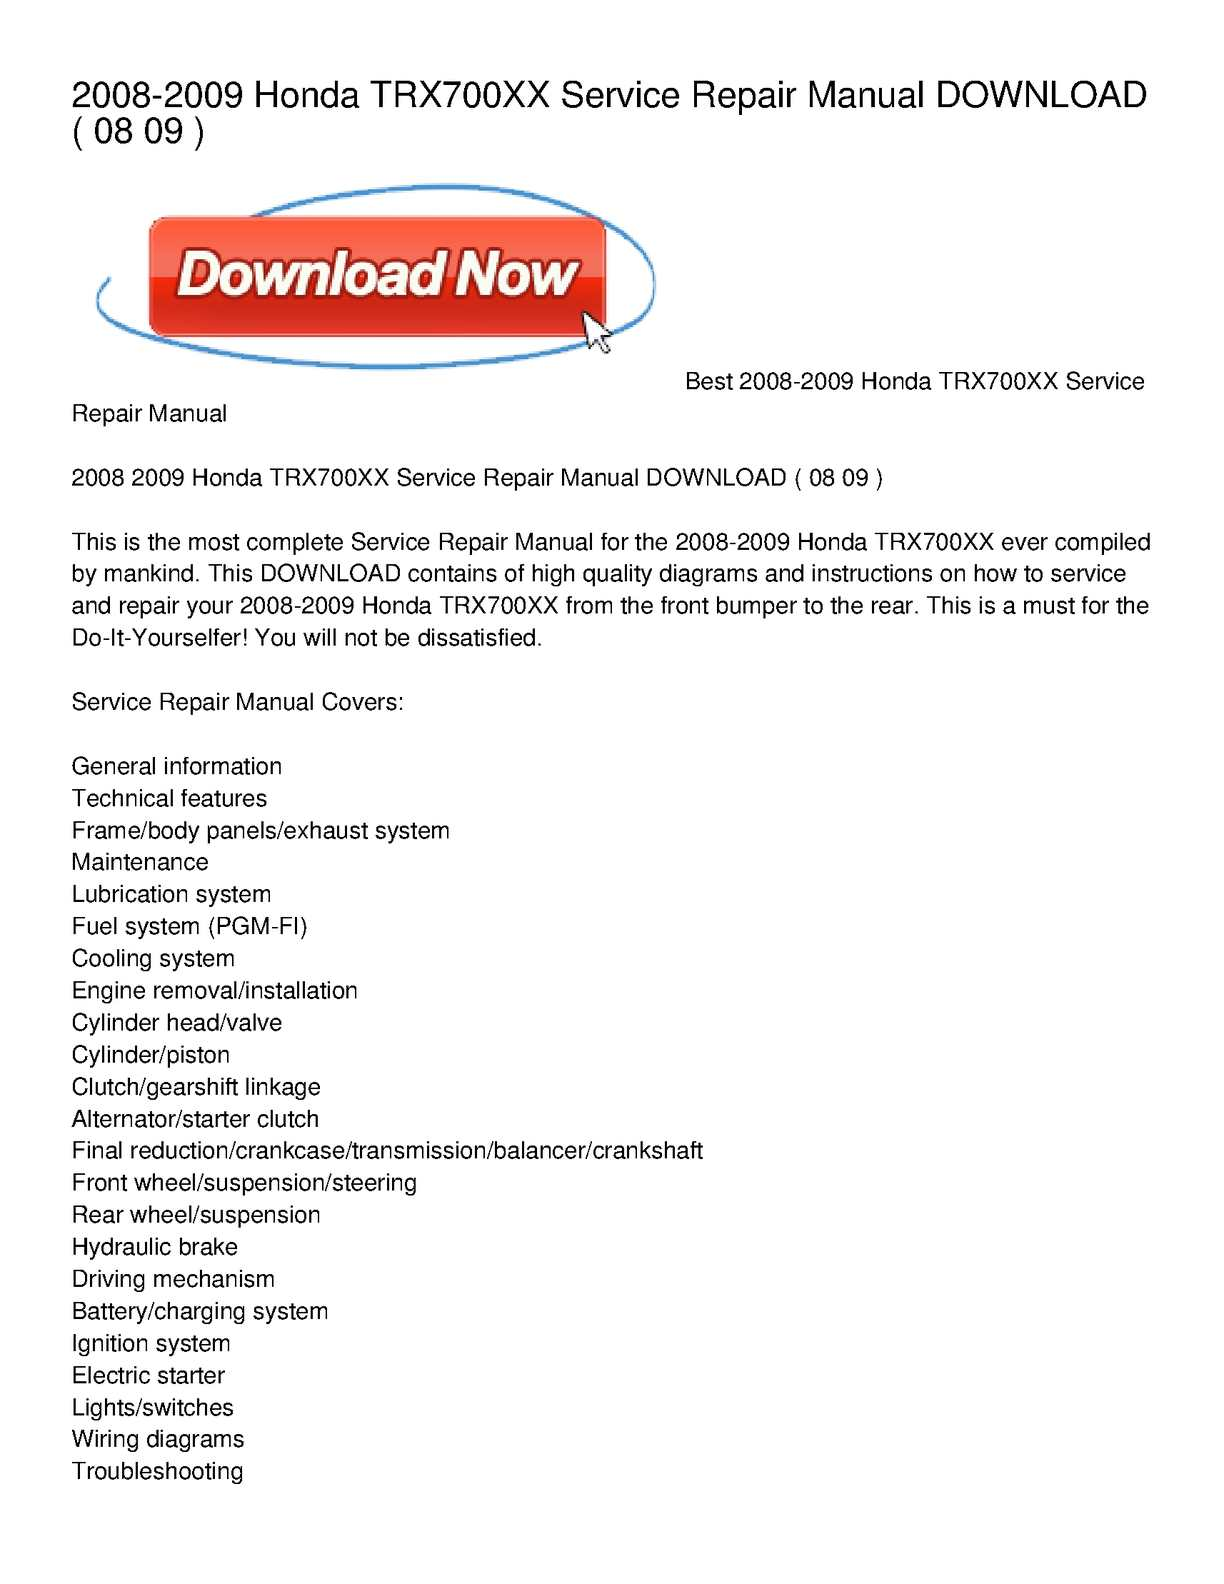 Calaméo - 2008-2009 Honda TRX700XX Service Repair Manual ... on